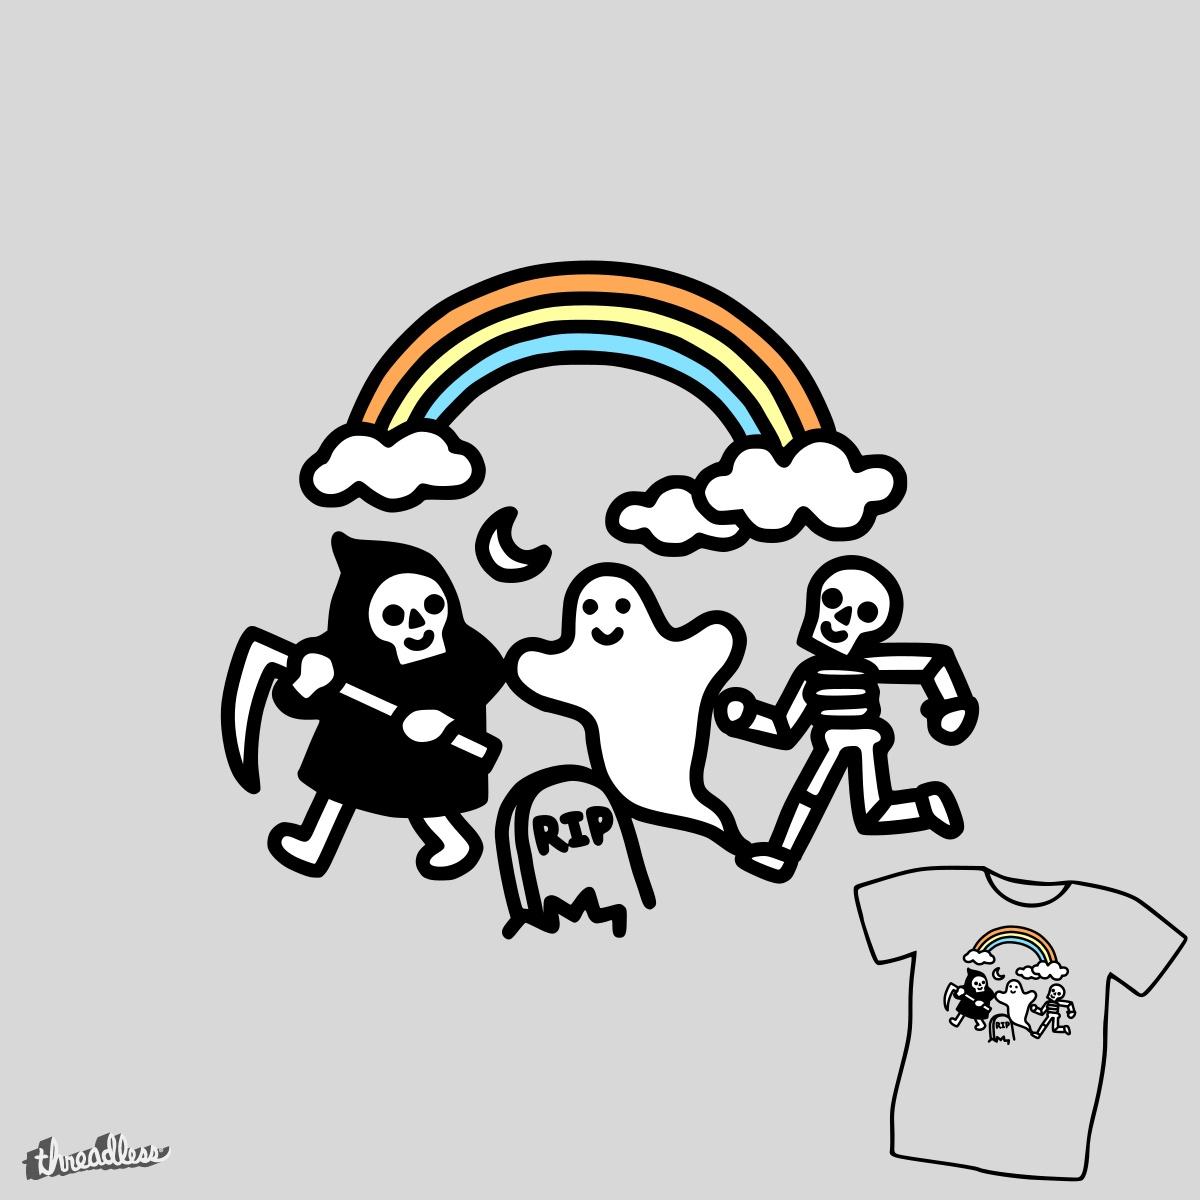 Spooky Pals by obinsun on Threadless